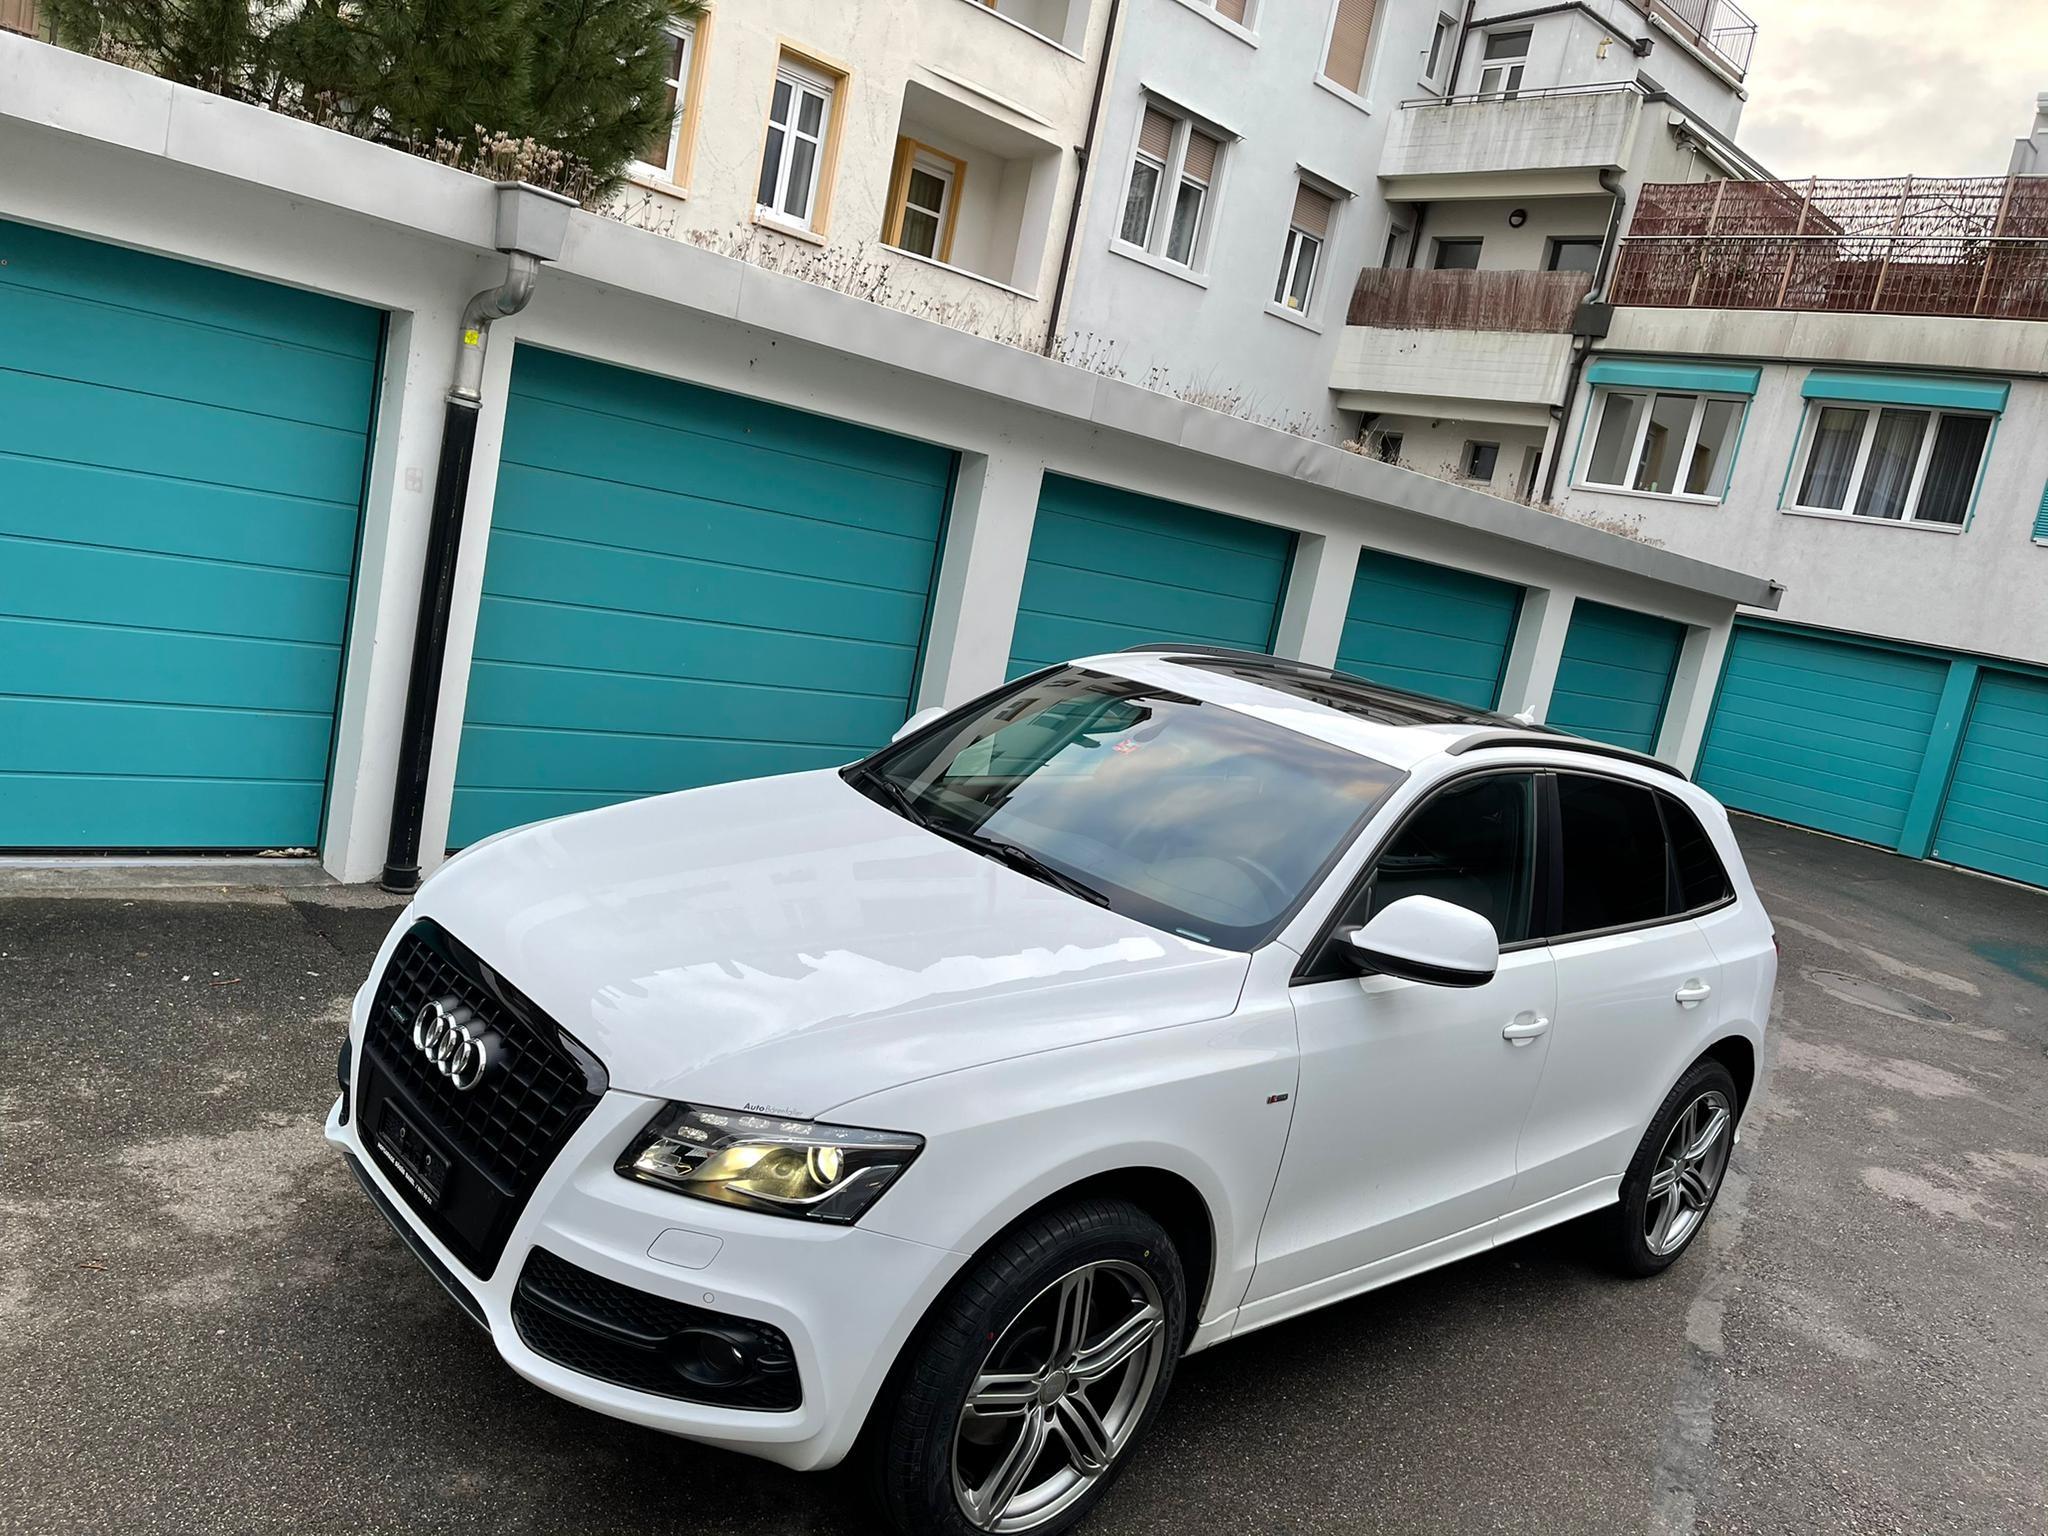 suv Audi Q5 Neu mfk neu service 1 Jahr Garantie